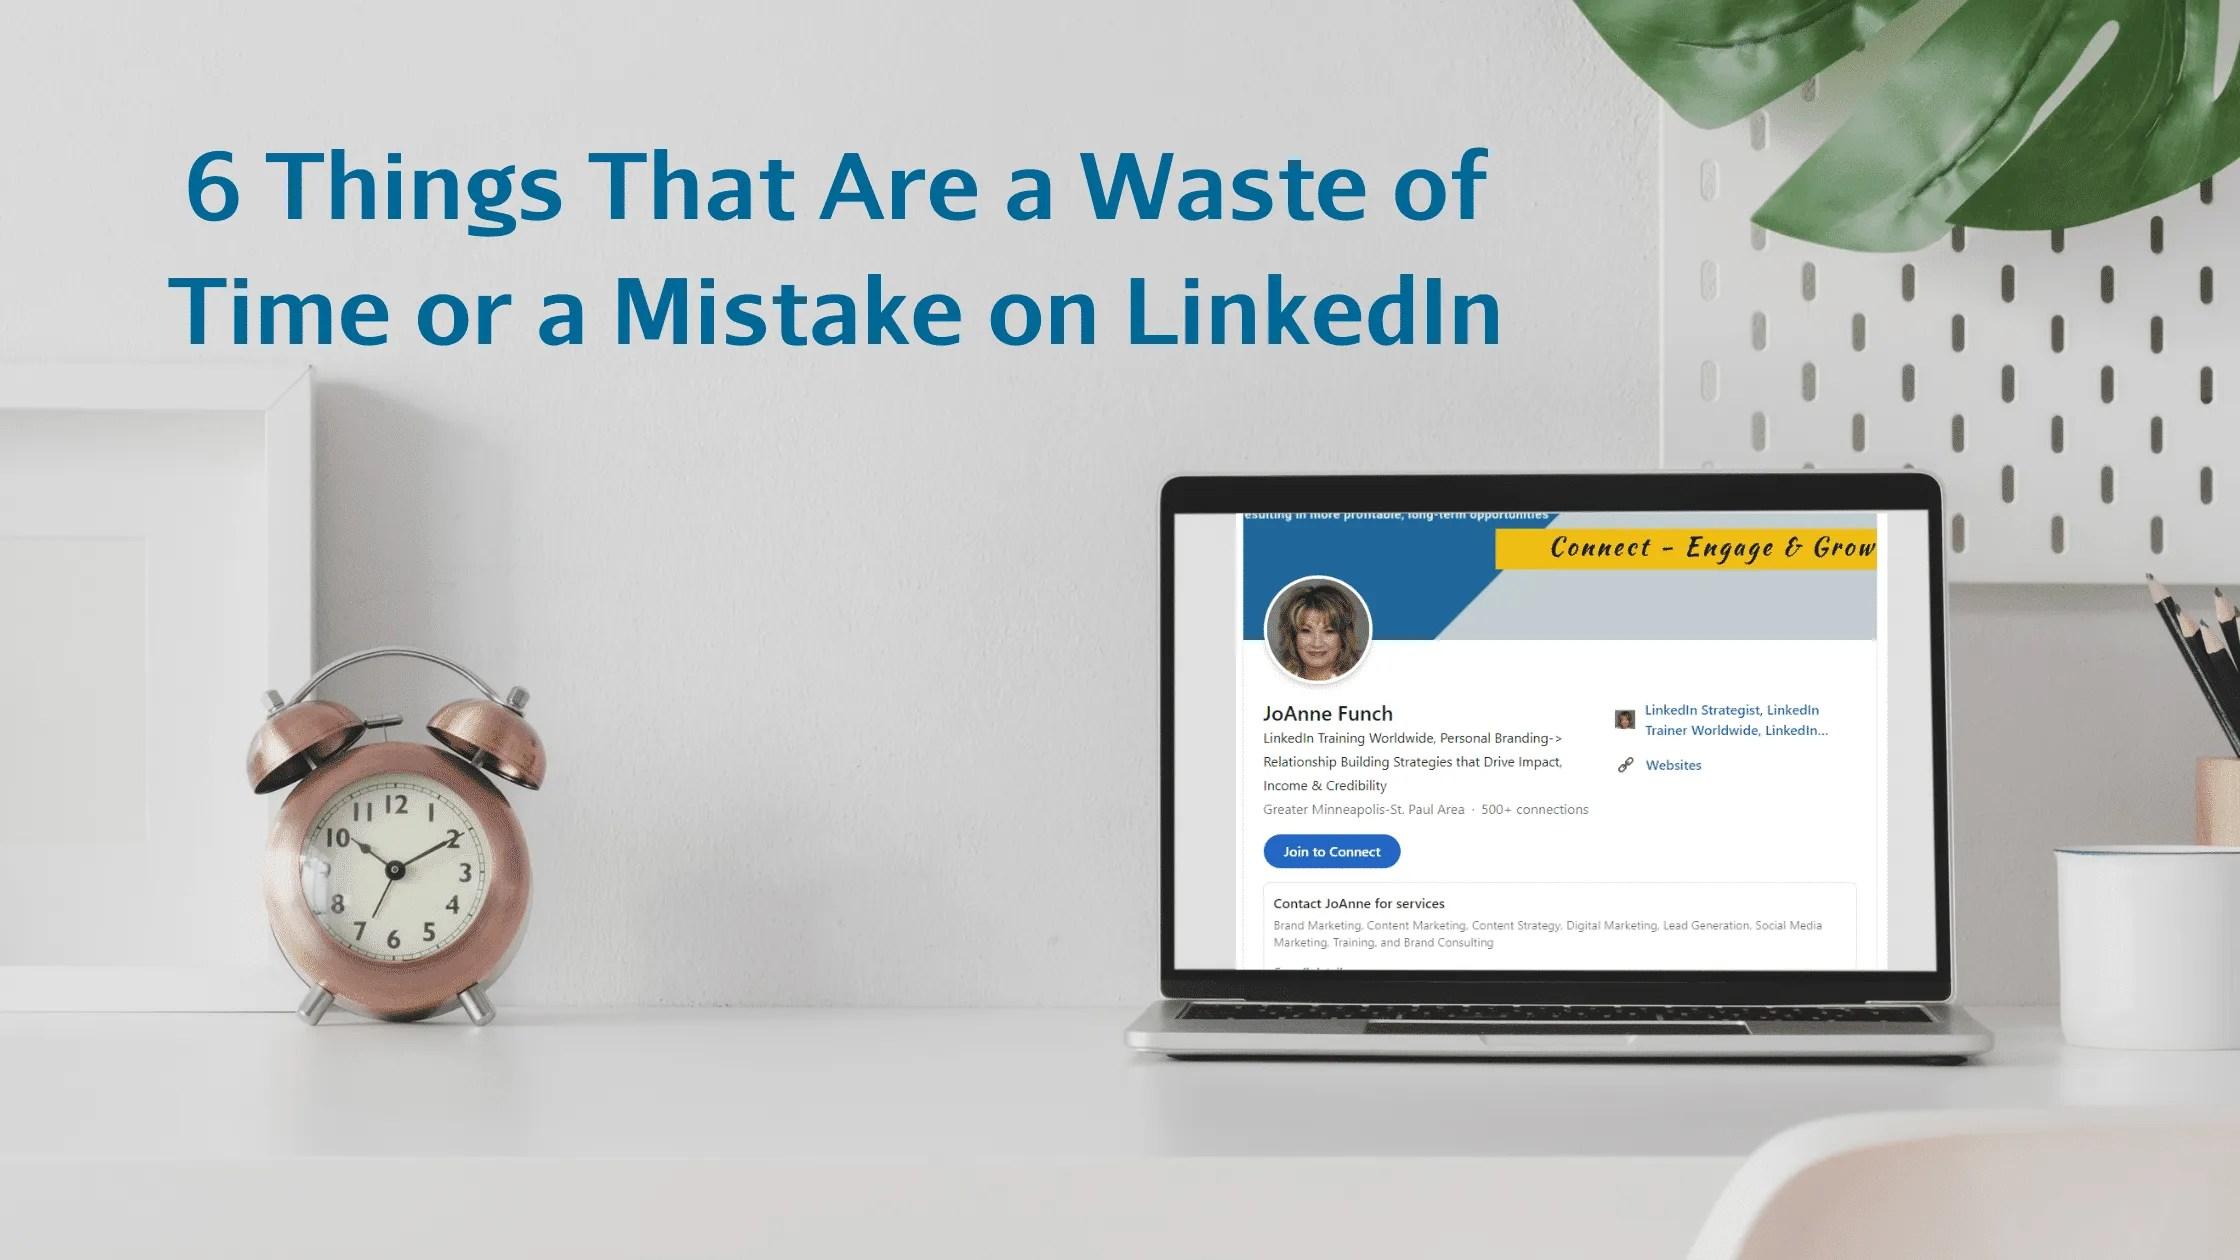 6 Mistakes on LinkedIn